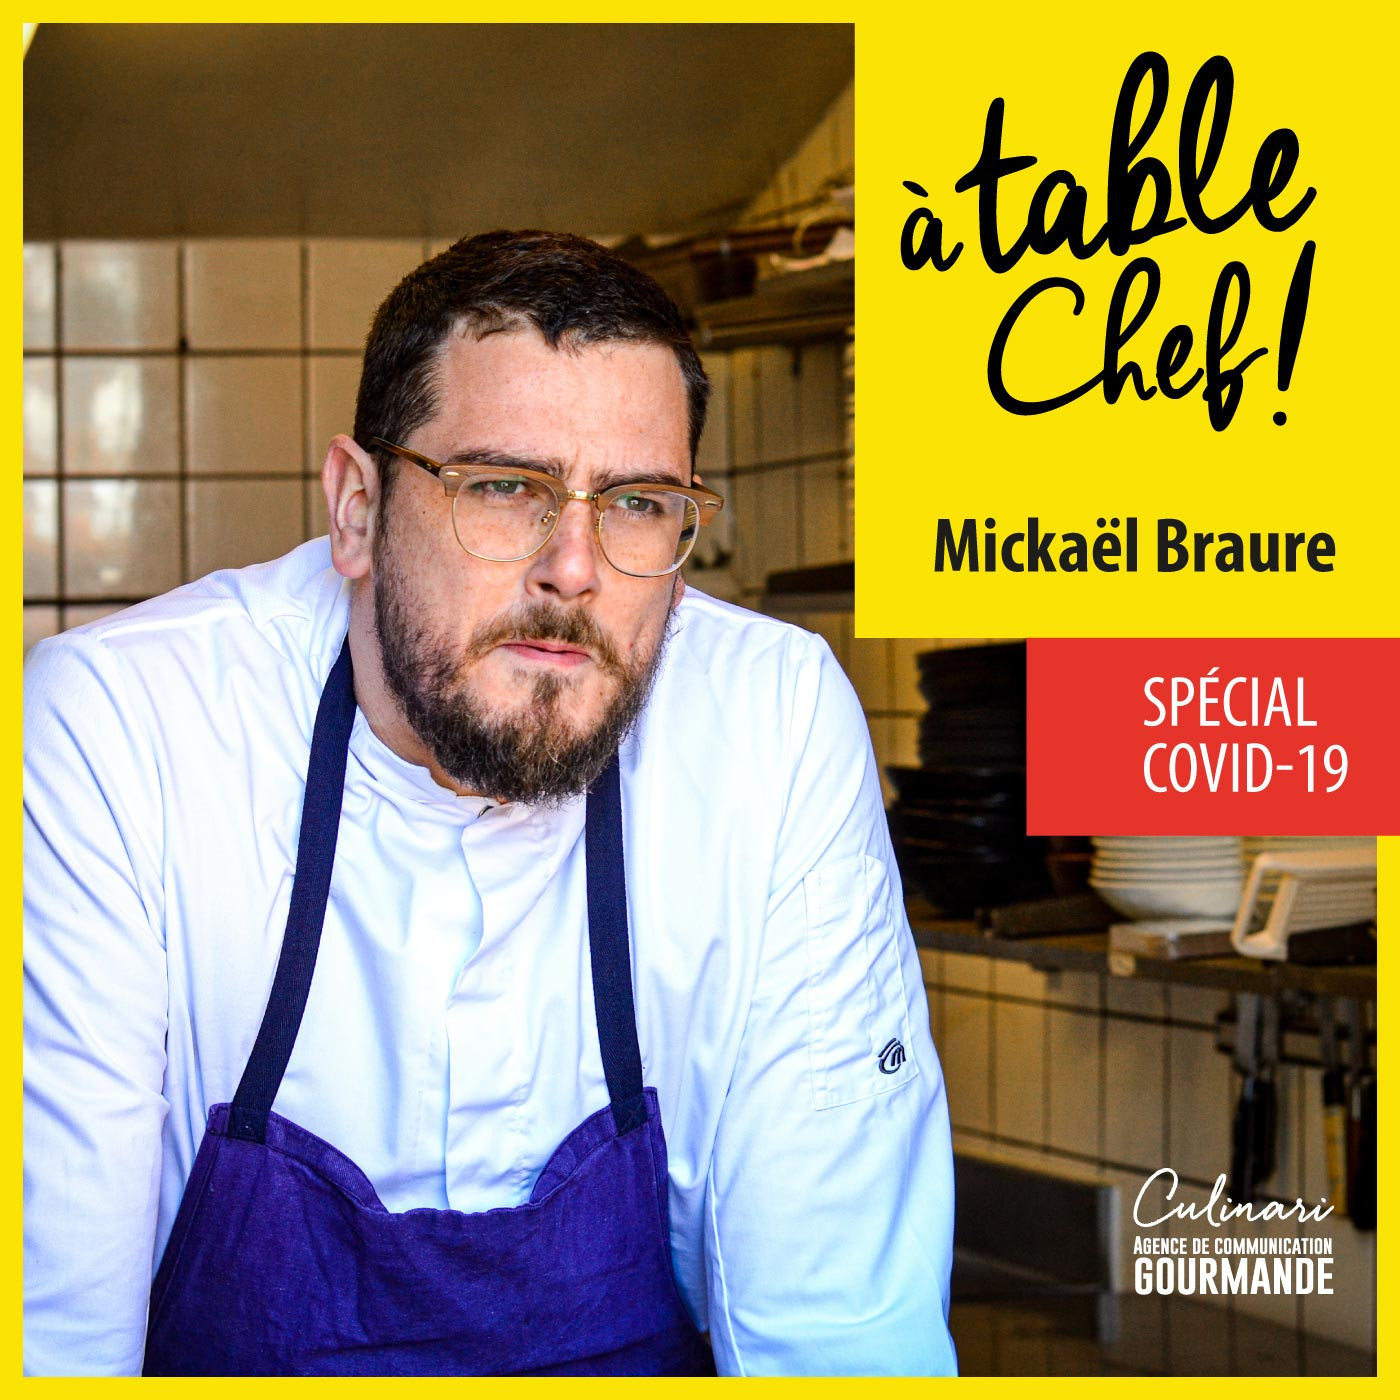 Chef Mickaël Braure